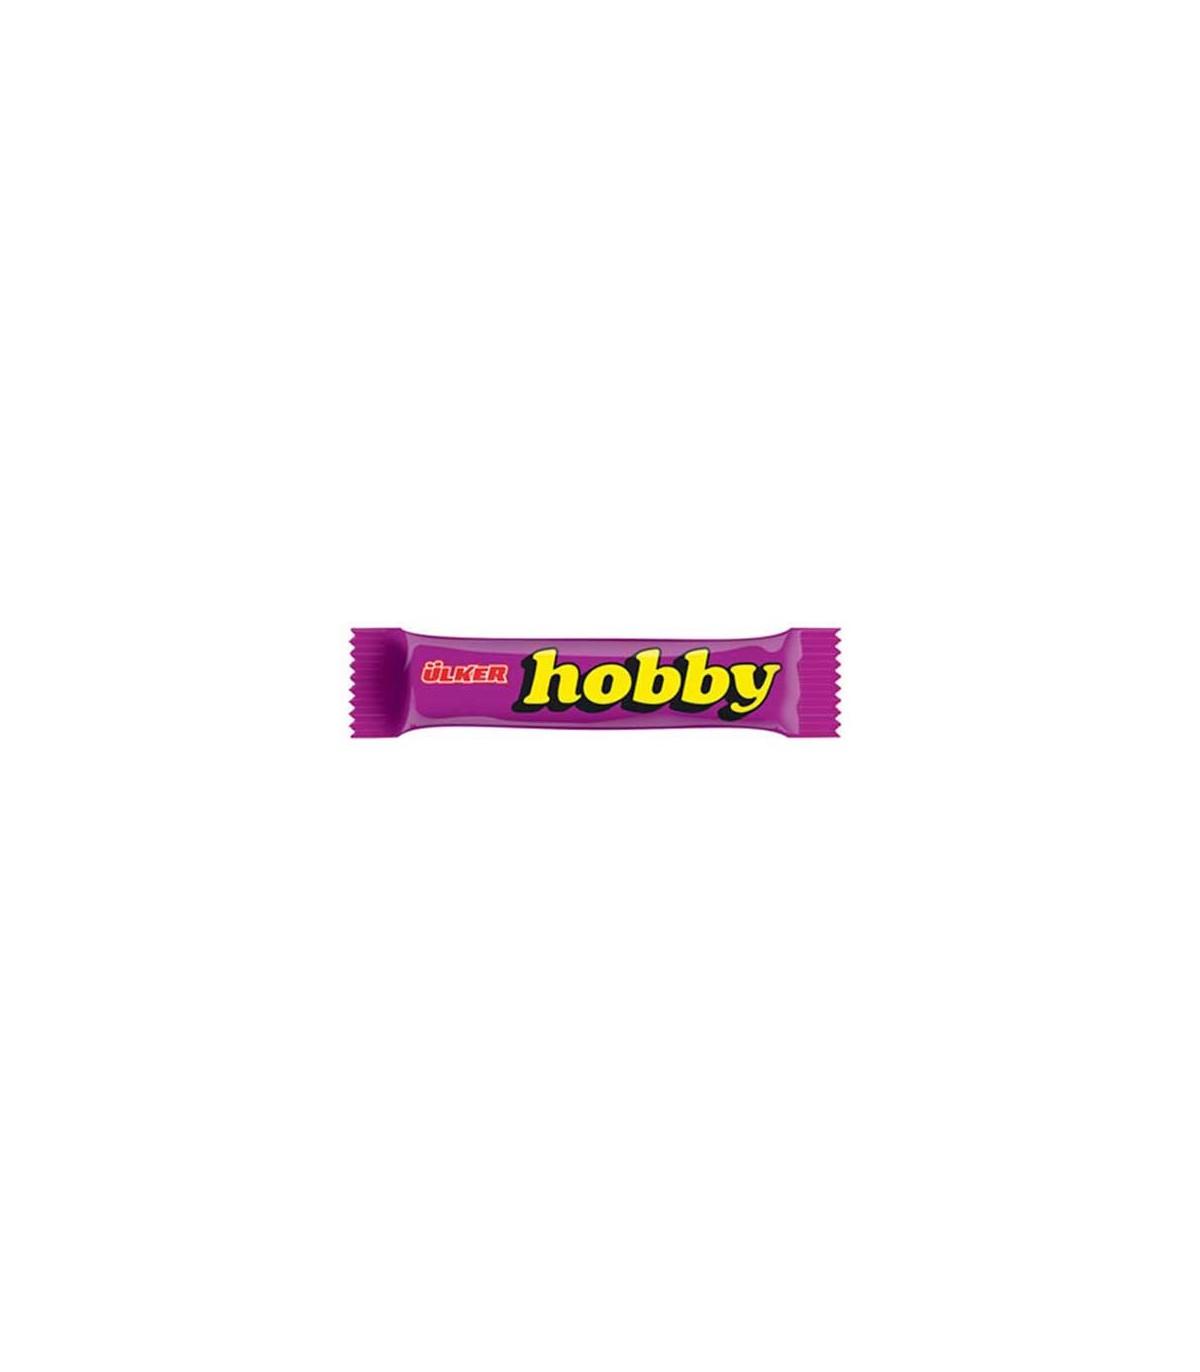 Hobby شکلات فندقی 30 گرمی هوبی